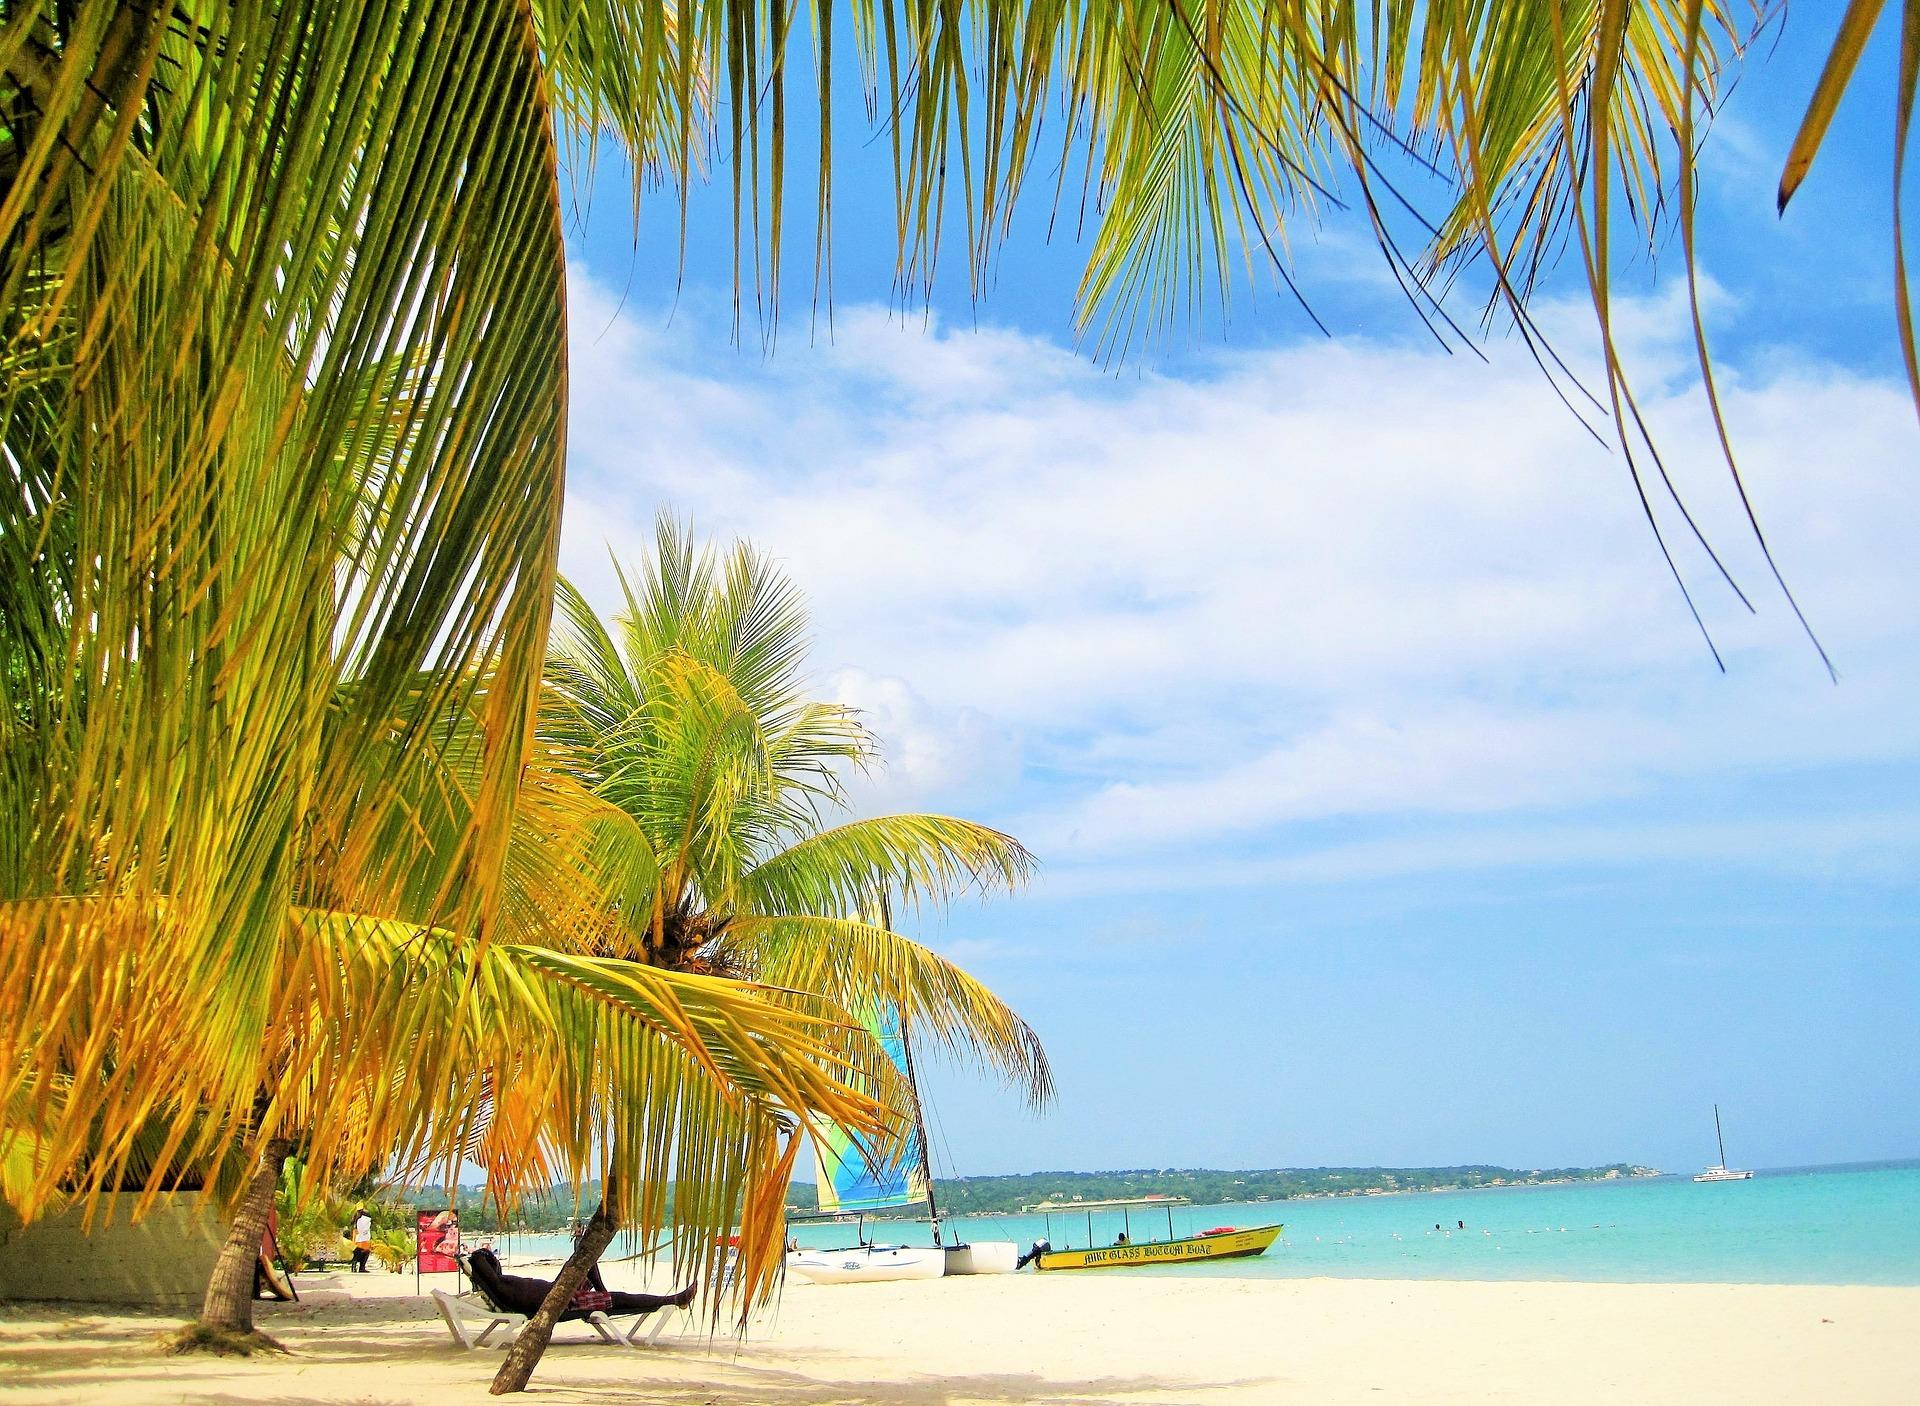 TripAdvisor Travelers Choice Awards Jamaica As The Top Caribbean Island